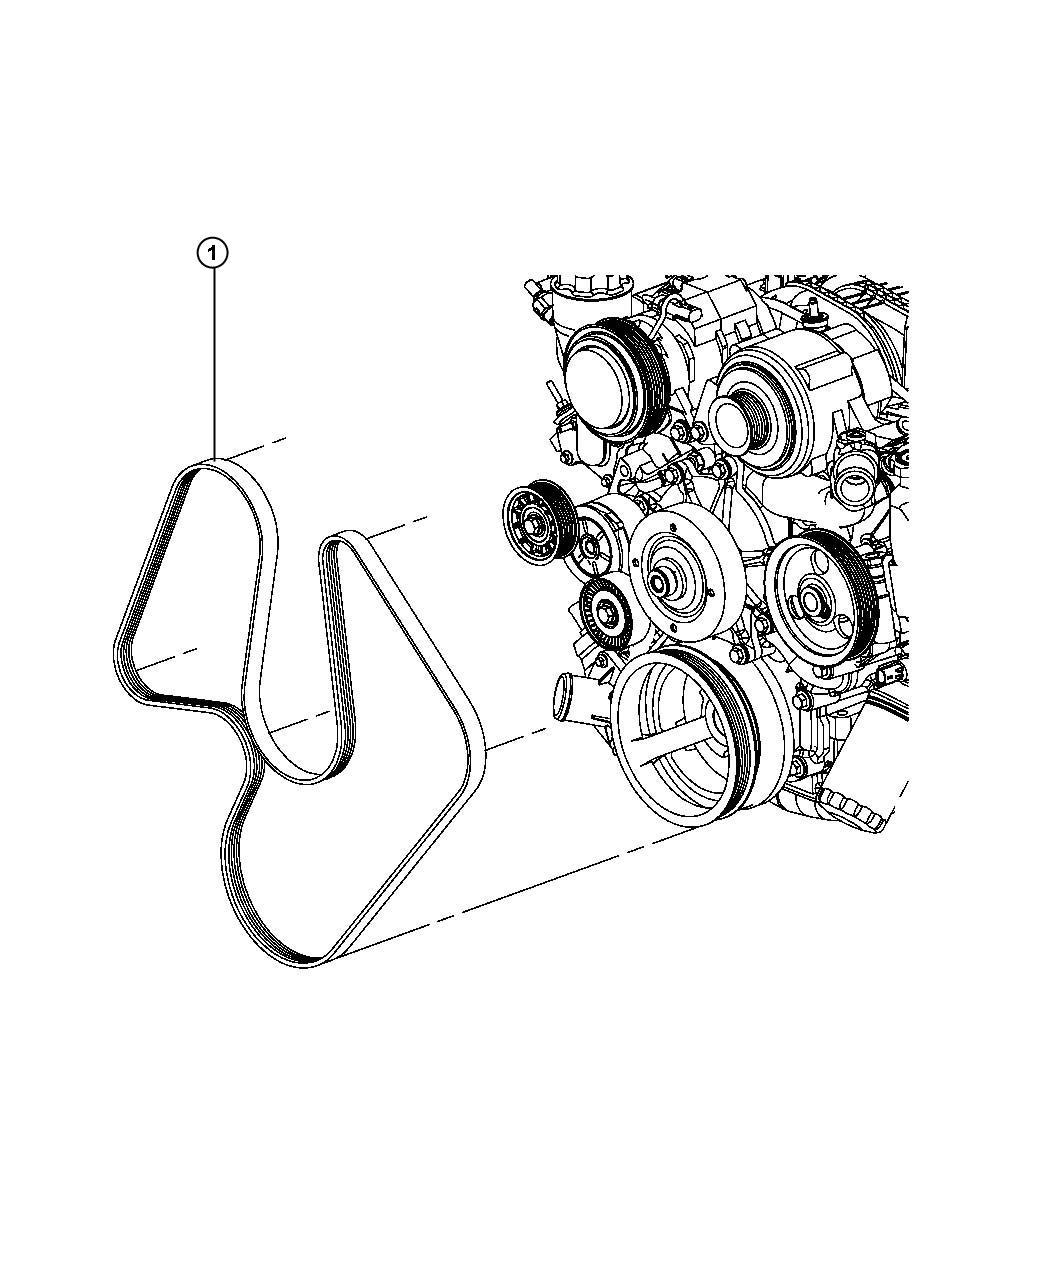 2013 Jeep Grand Cherokee Belt  Serpentine   Electro-hydraulic Power Steering